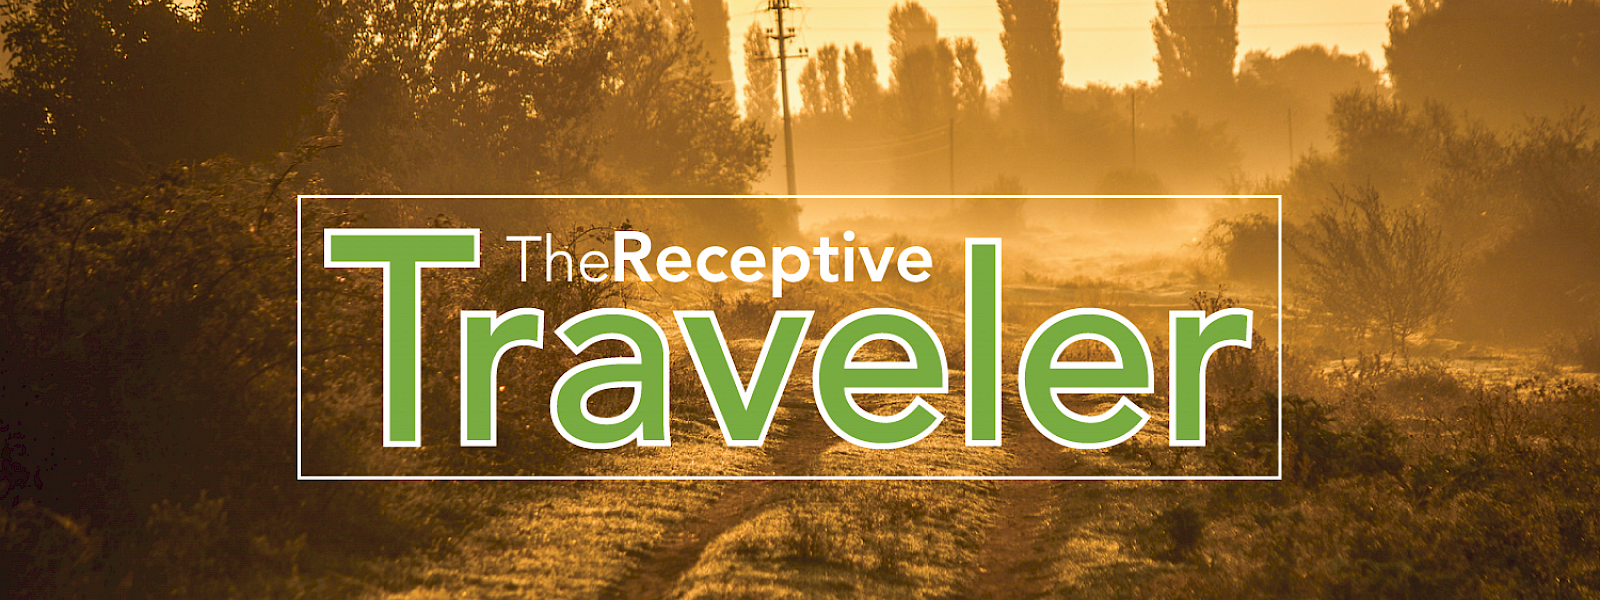 The Receptive Traveler